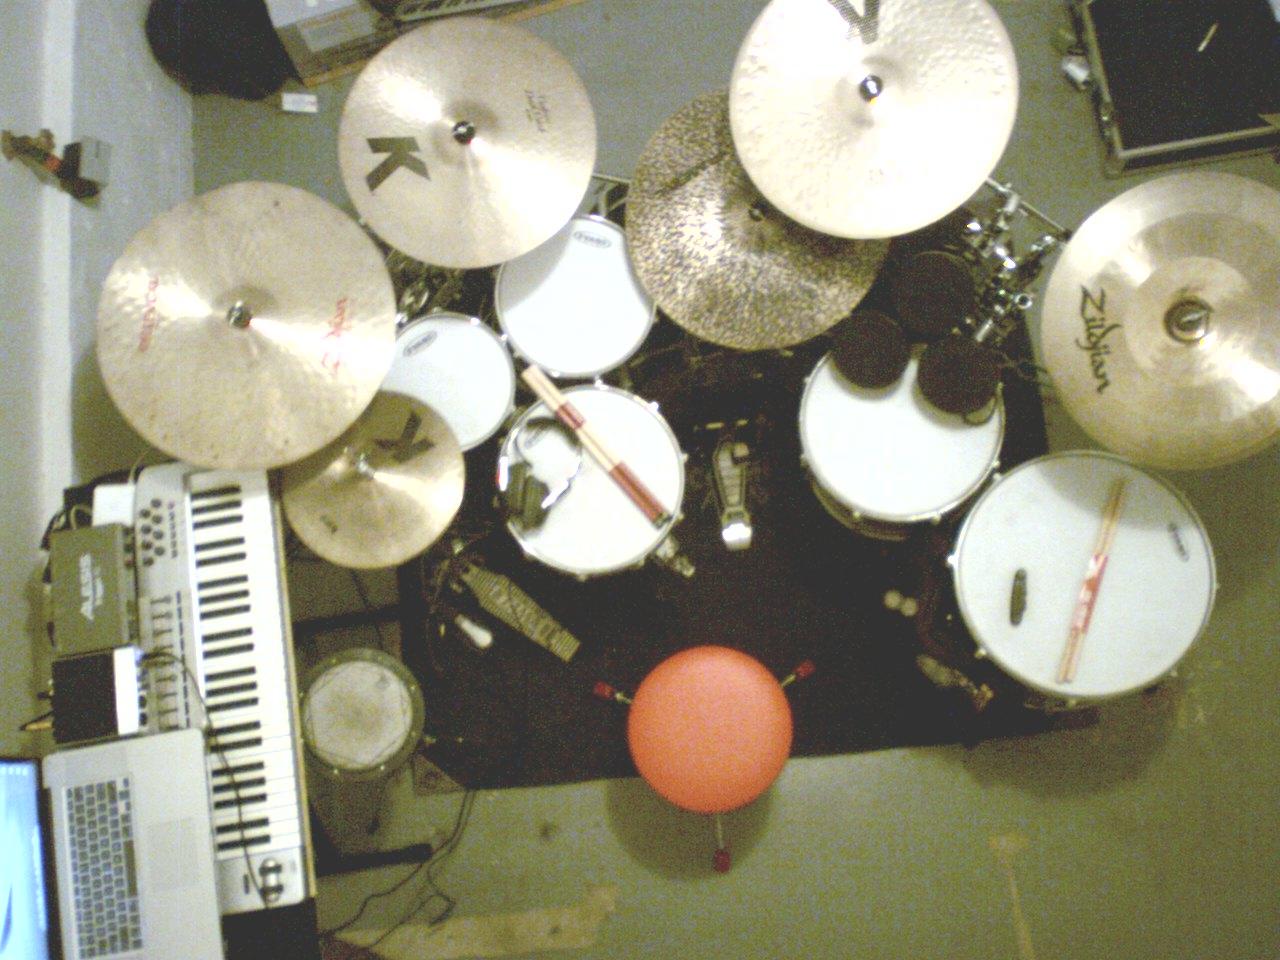 2009 East Coast Tour Drum Set